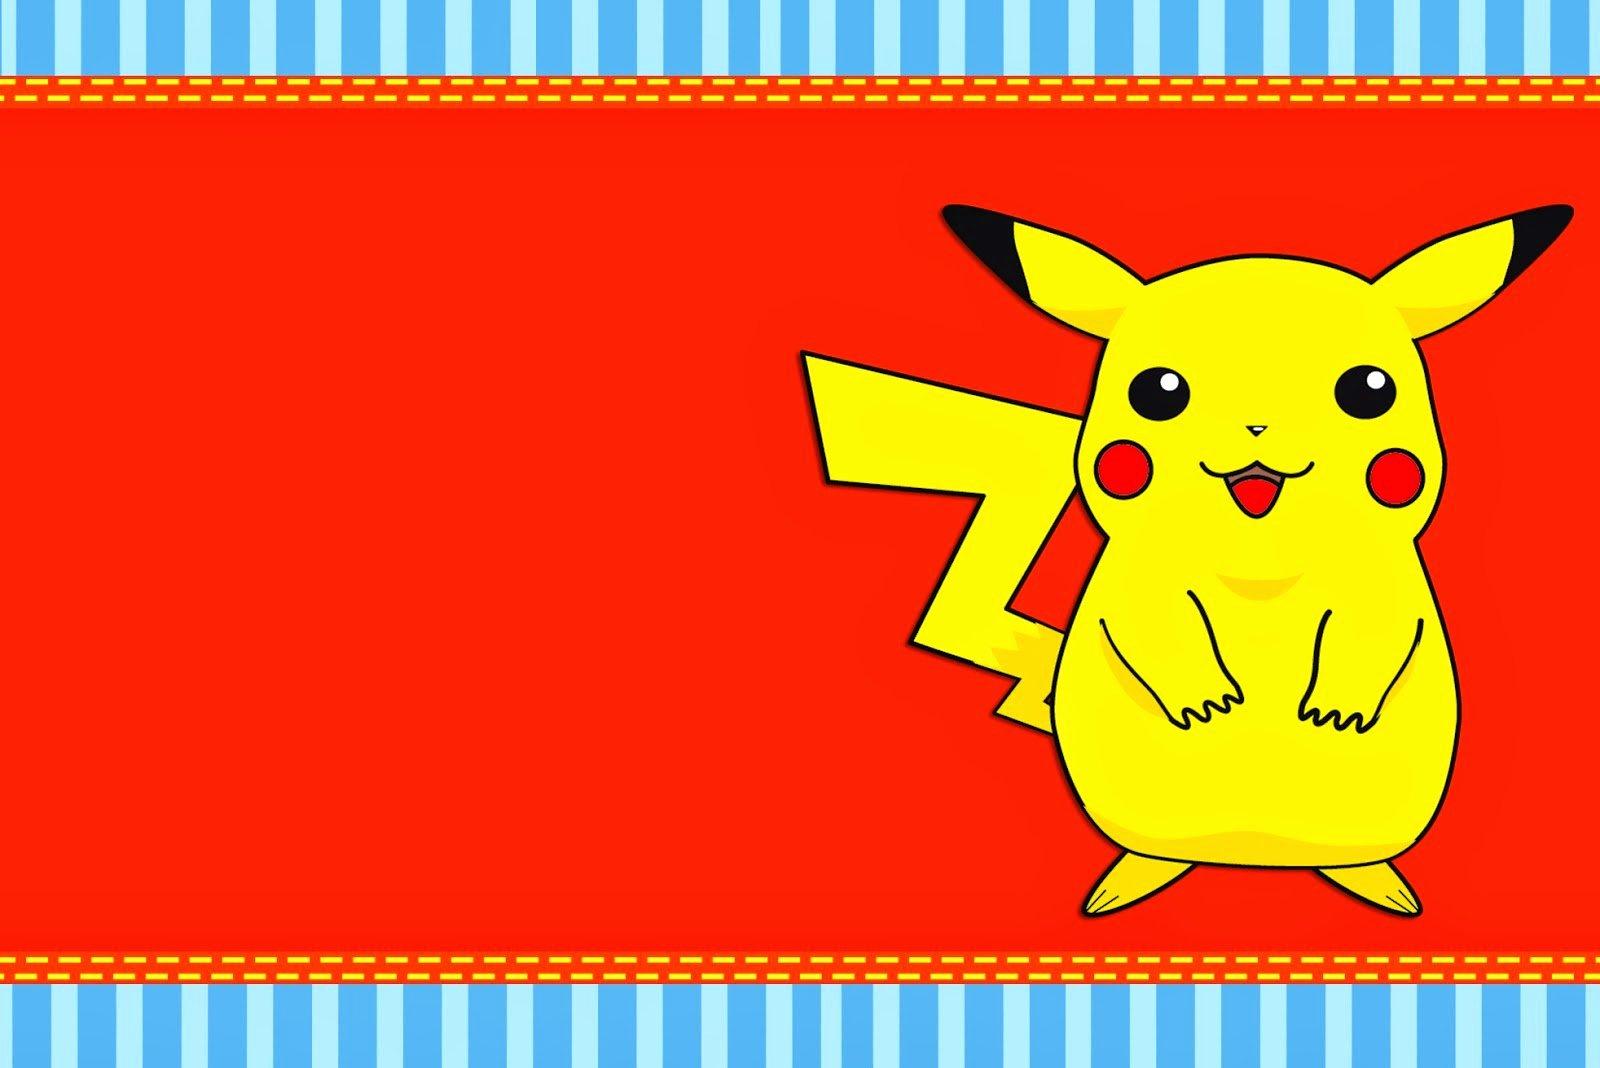 Pokemon Birthday Card Template Best Of Pokemon Free Printable Invitations Oh My Fiesta for Geeks